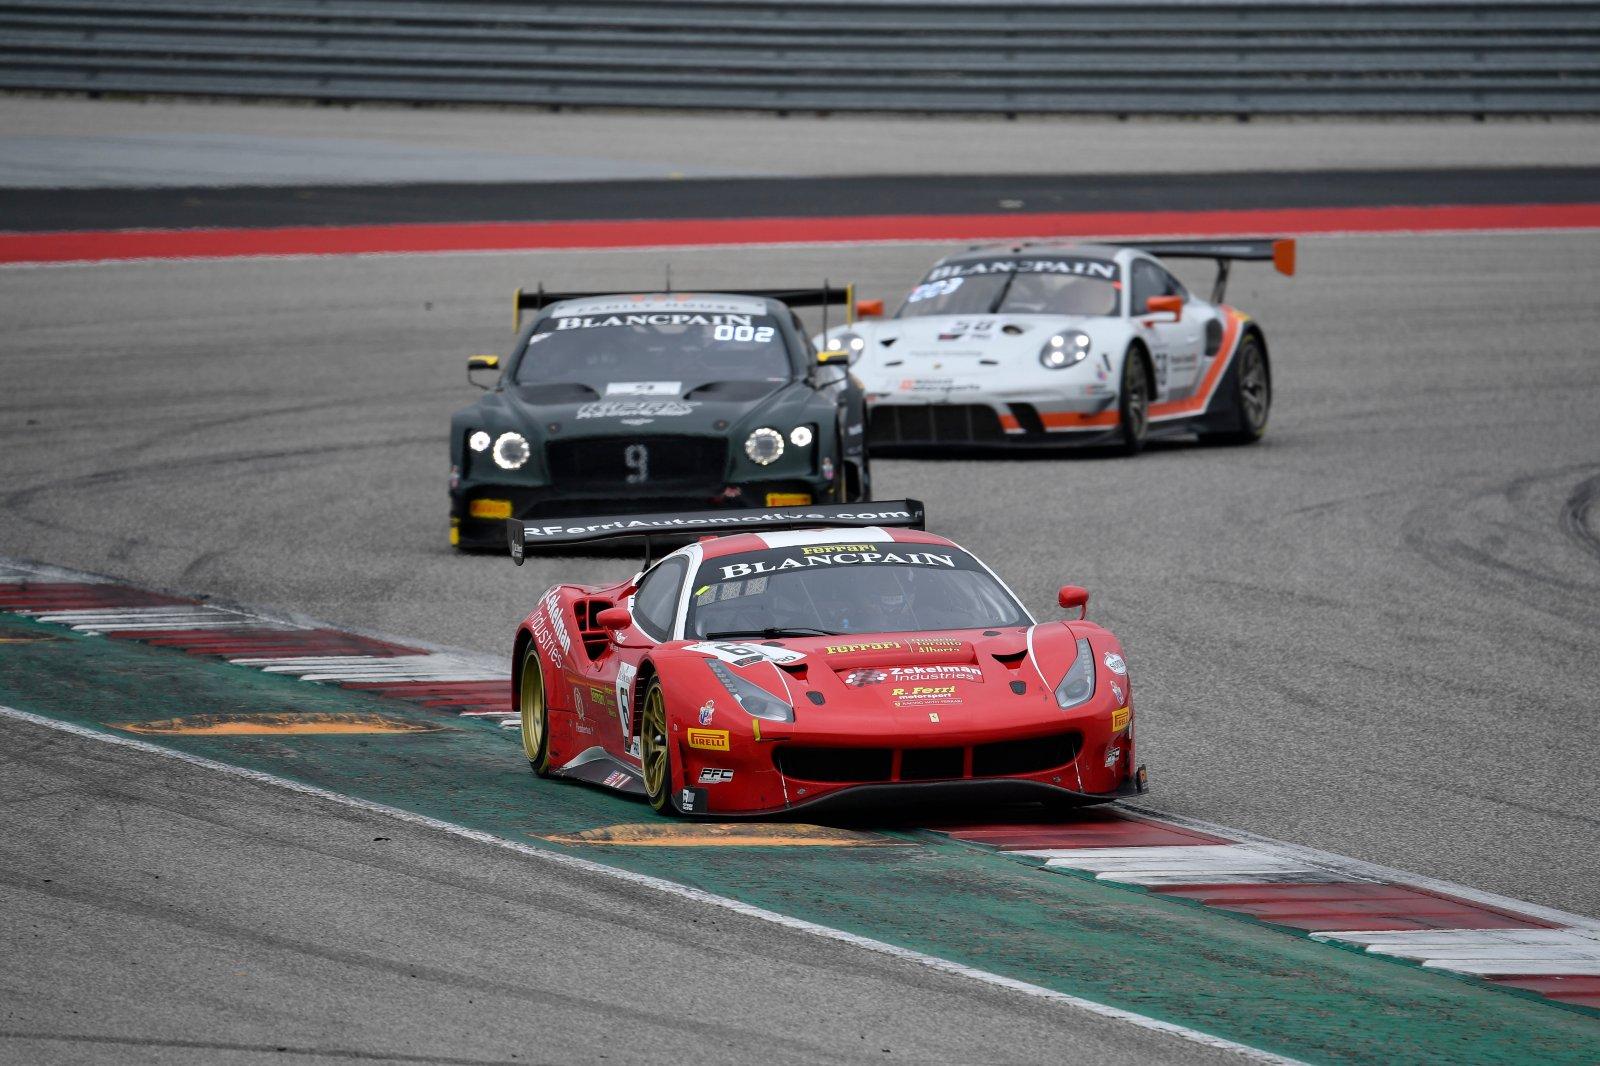 R. Ferri Motorsport, Miguel Molina, Toni Vilander, Ferrari 488 GT3, Ferrari of Ontario / Toronto / Alberta, Zekelman Industries, #9: K-PAX Racing, Alvaro Pa